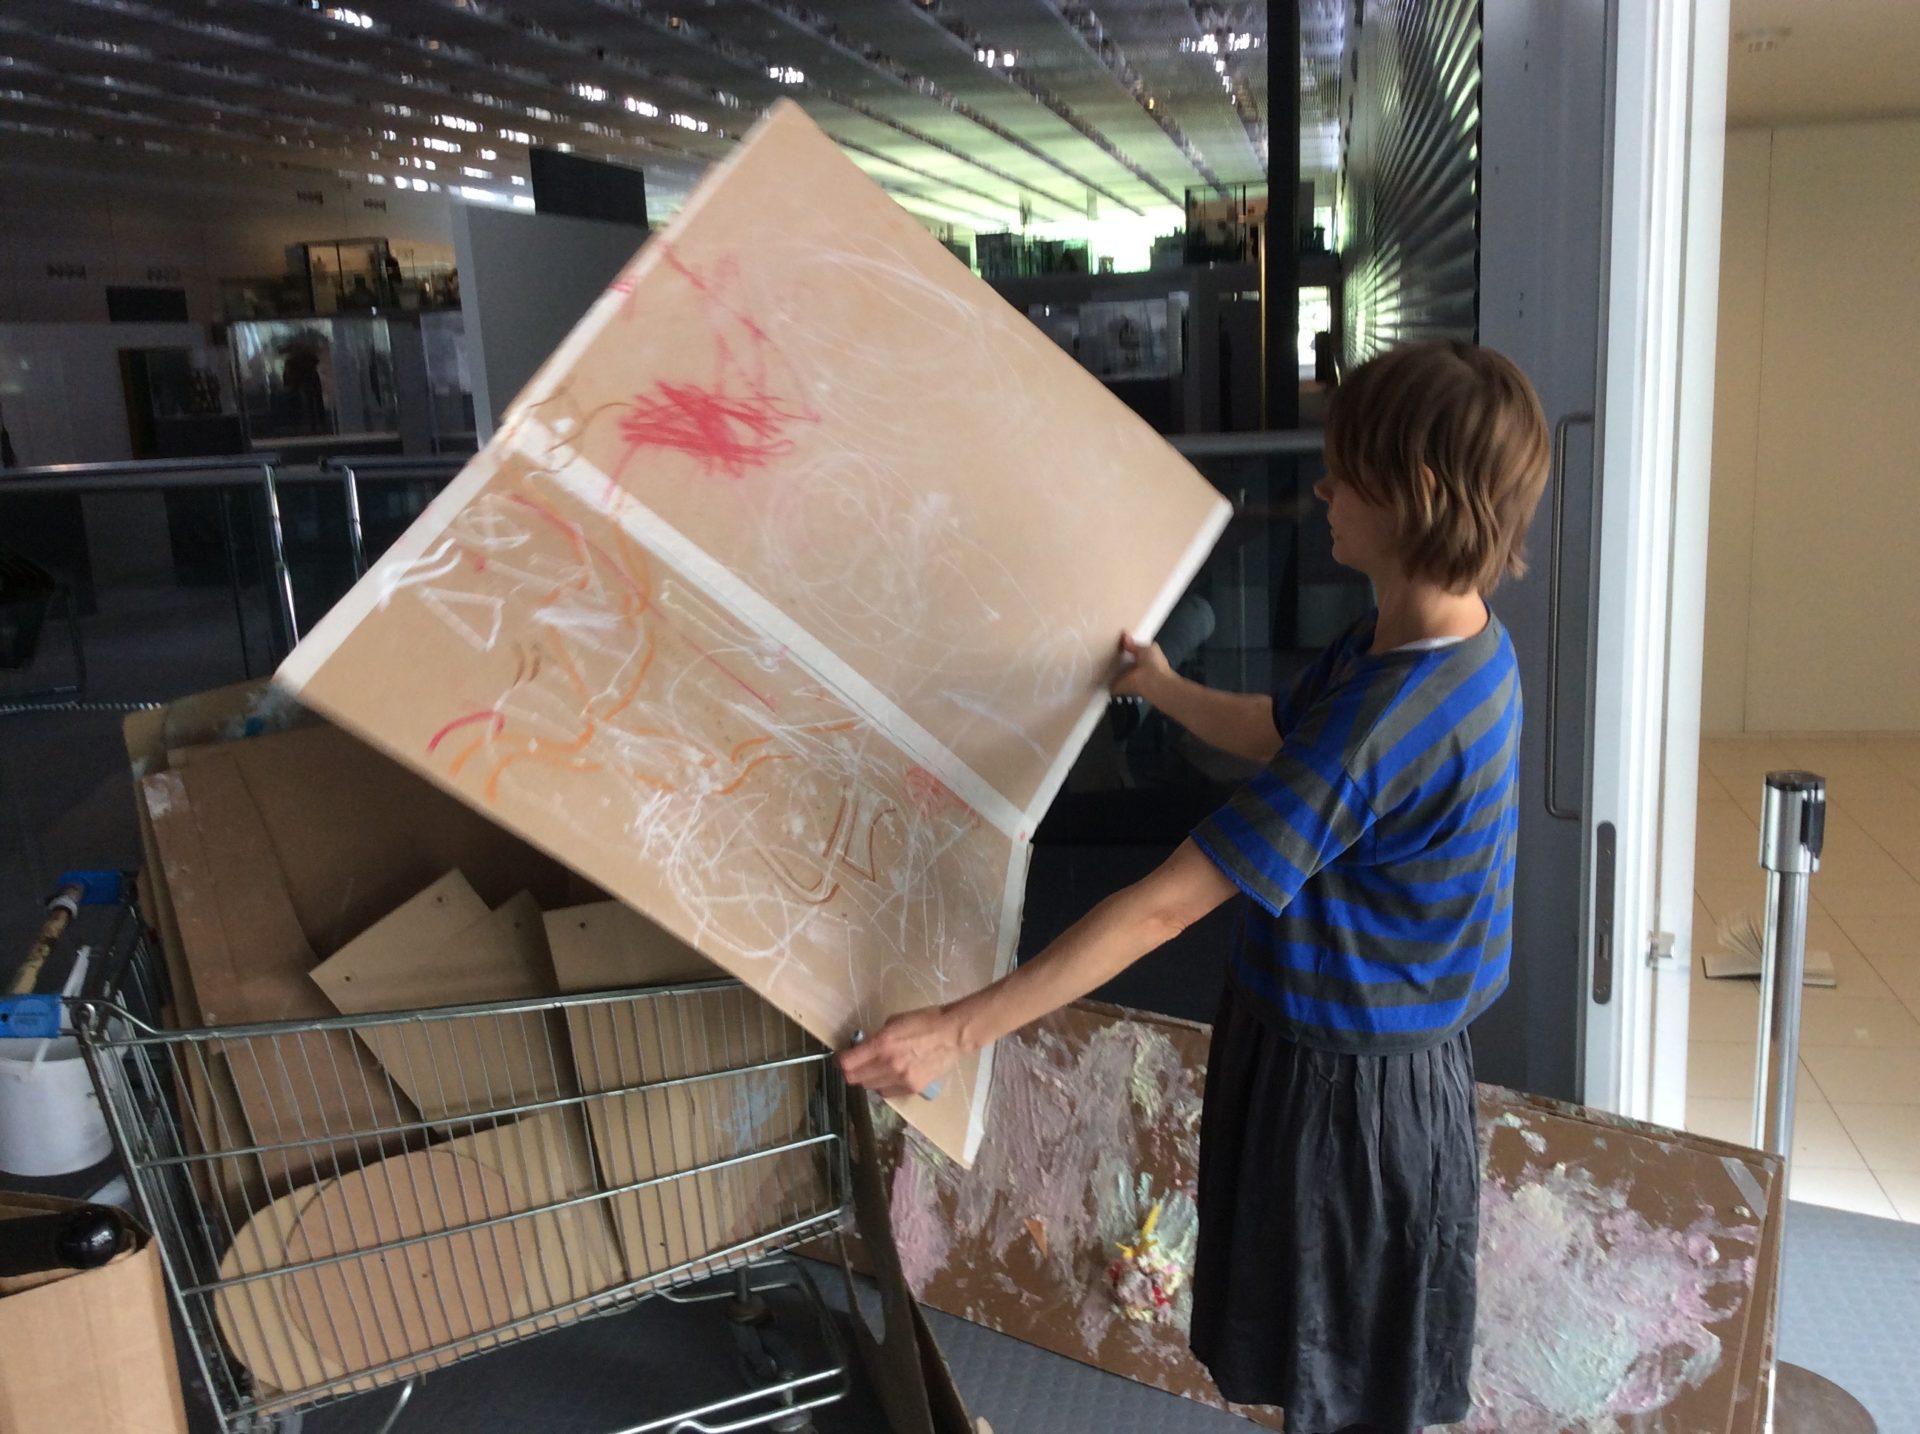 cardboard sheet, person, shopping trolley